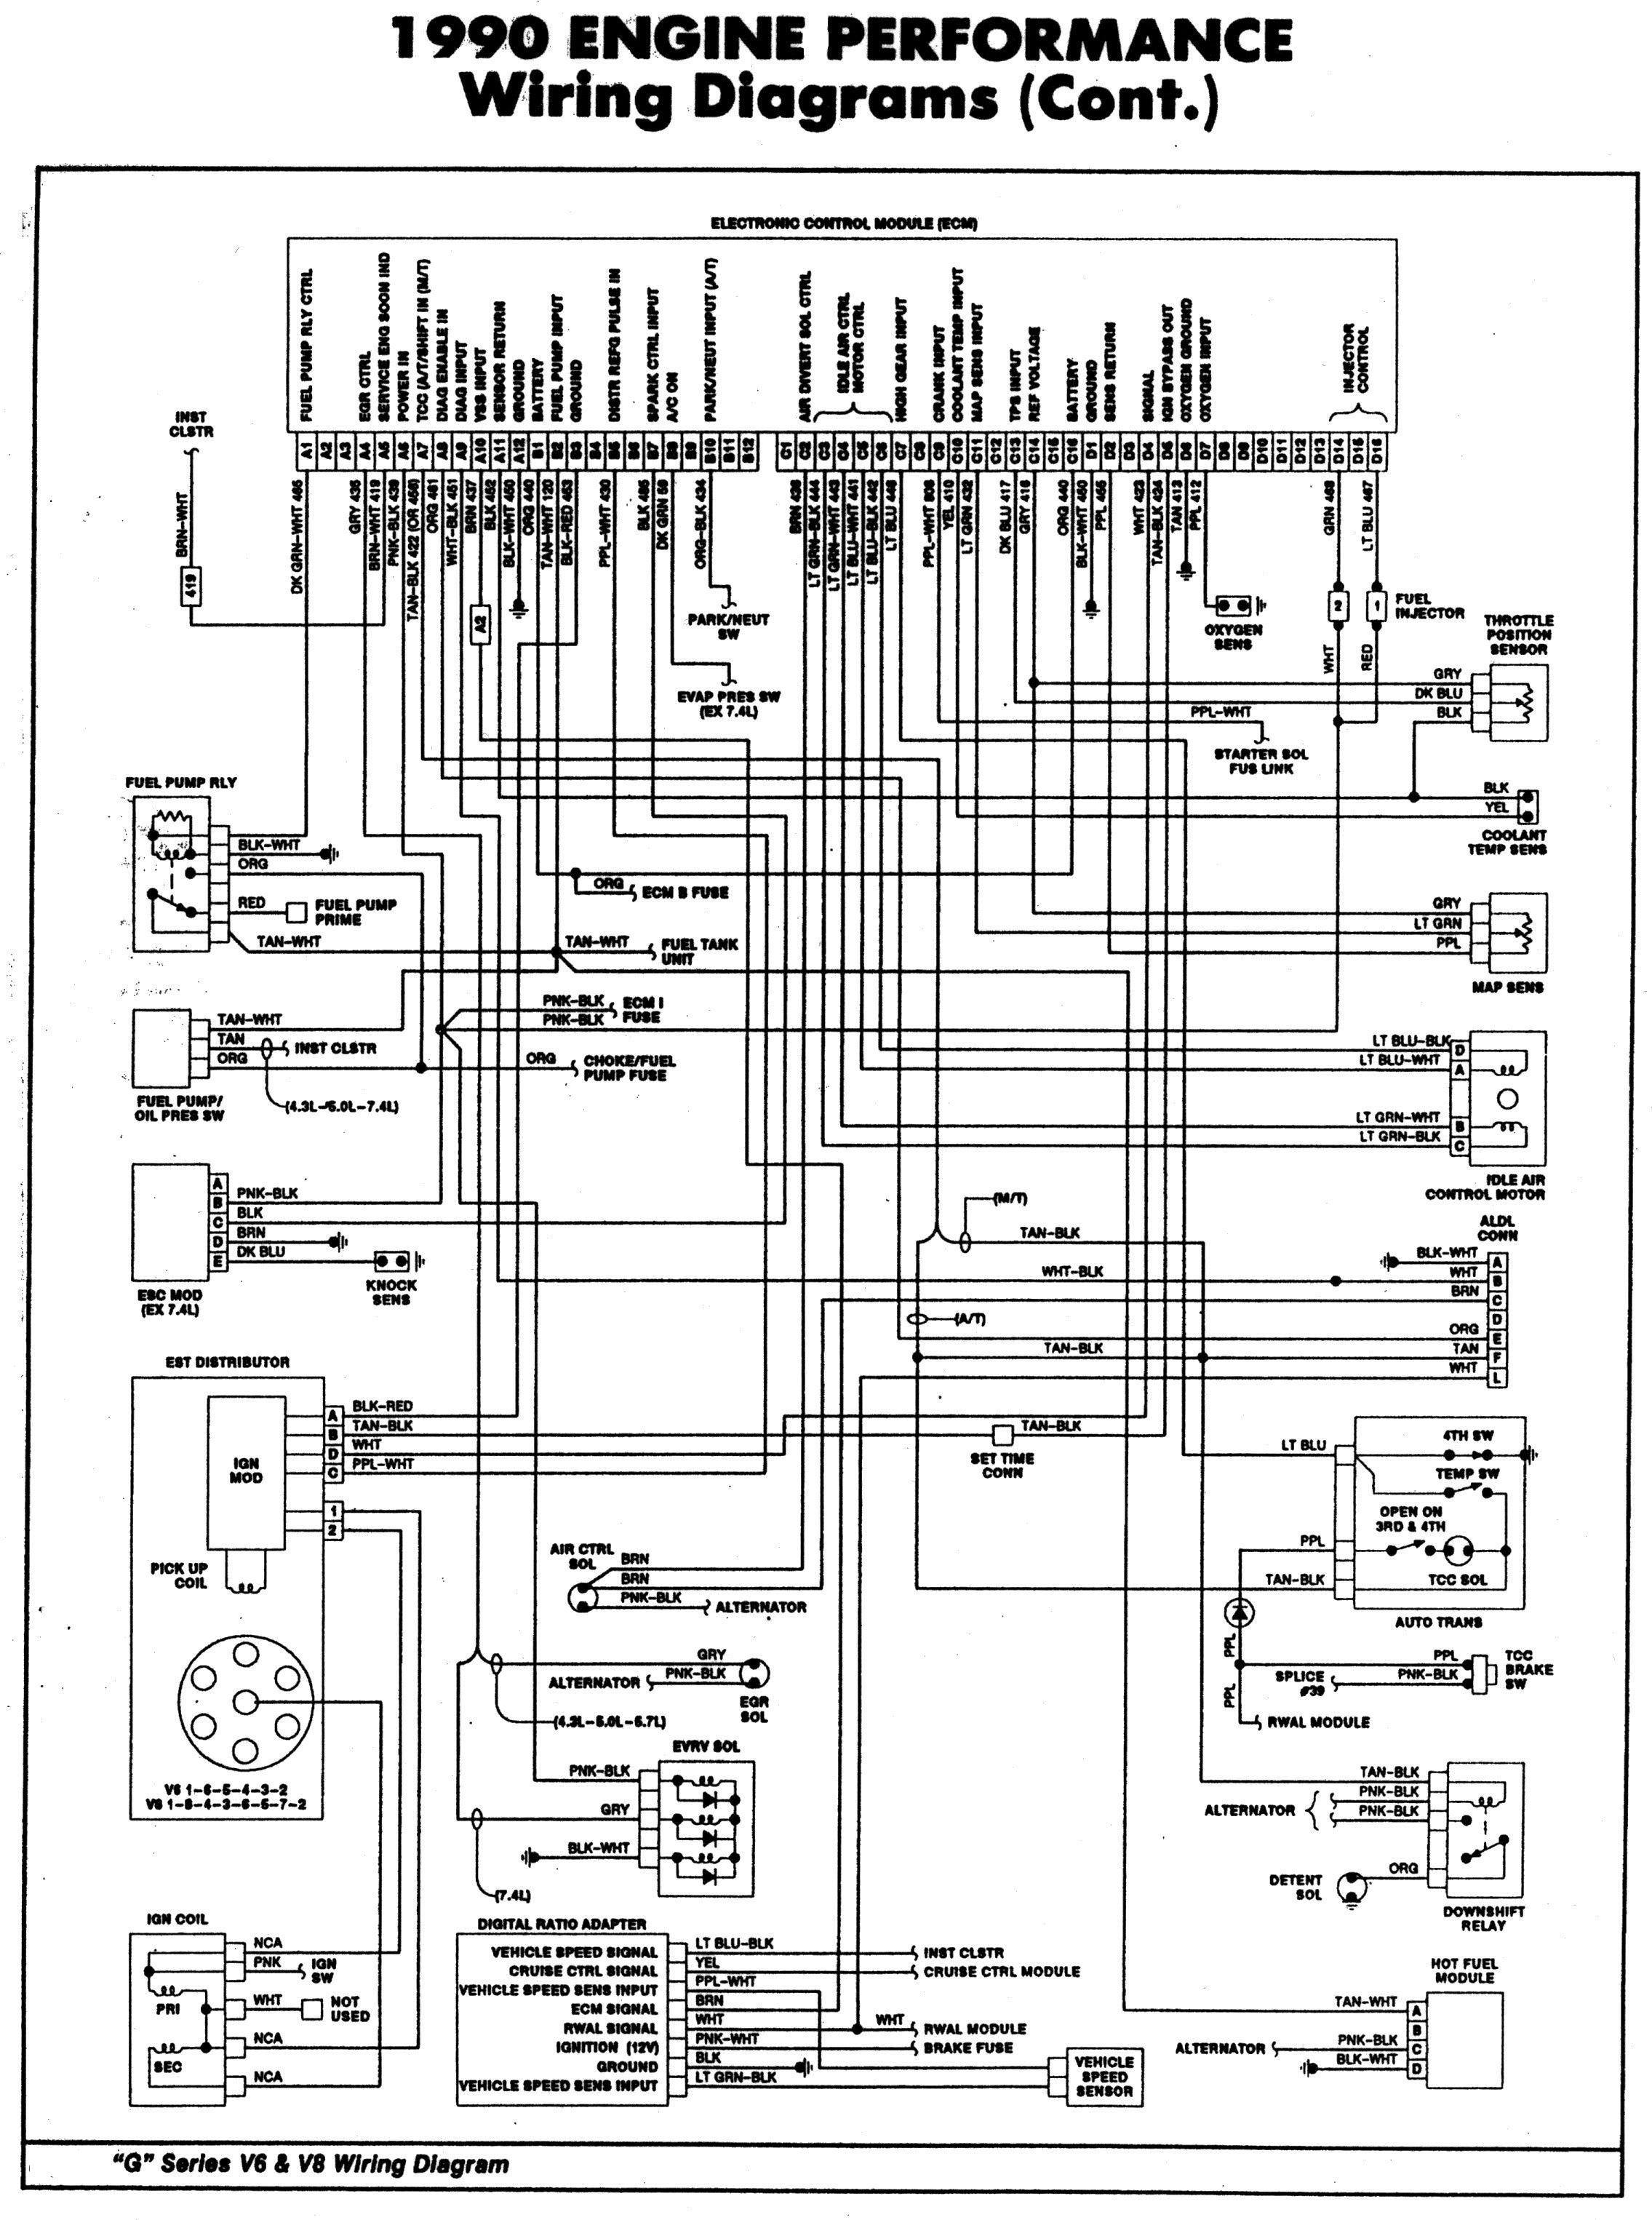 Brake Light Wiring Diagram 1994 Gmc Sierra 1500 Chevy Silverado Diagram Wiring Diagram Options Of Brake Light Wiring Diagram 1994 Gmc Sierra